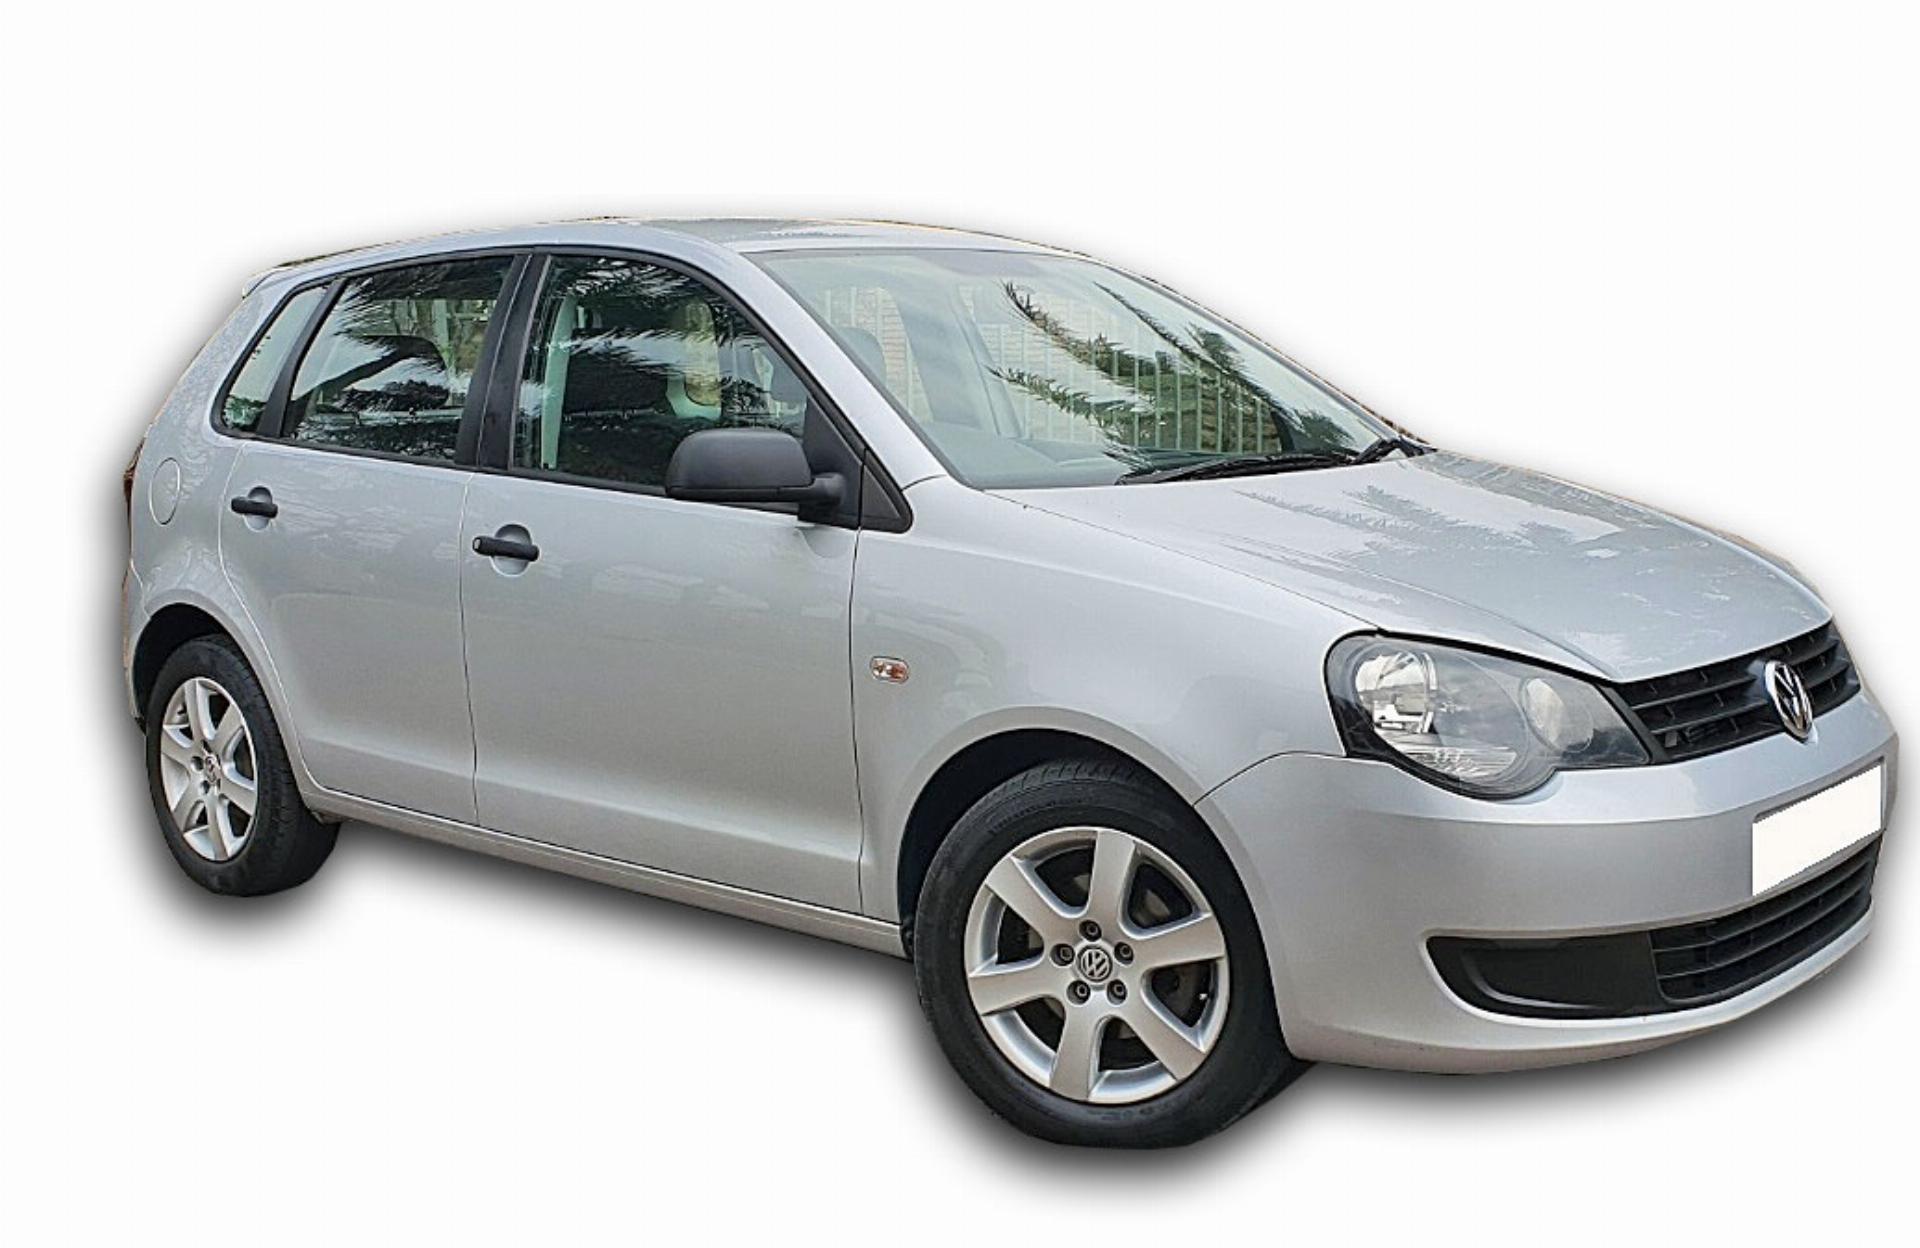 VW Polo Vivo 1.4 Blueline